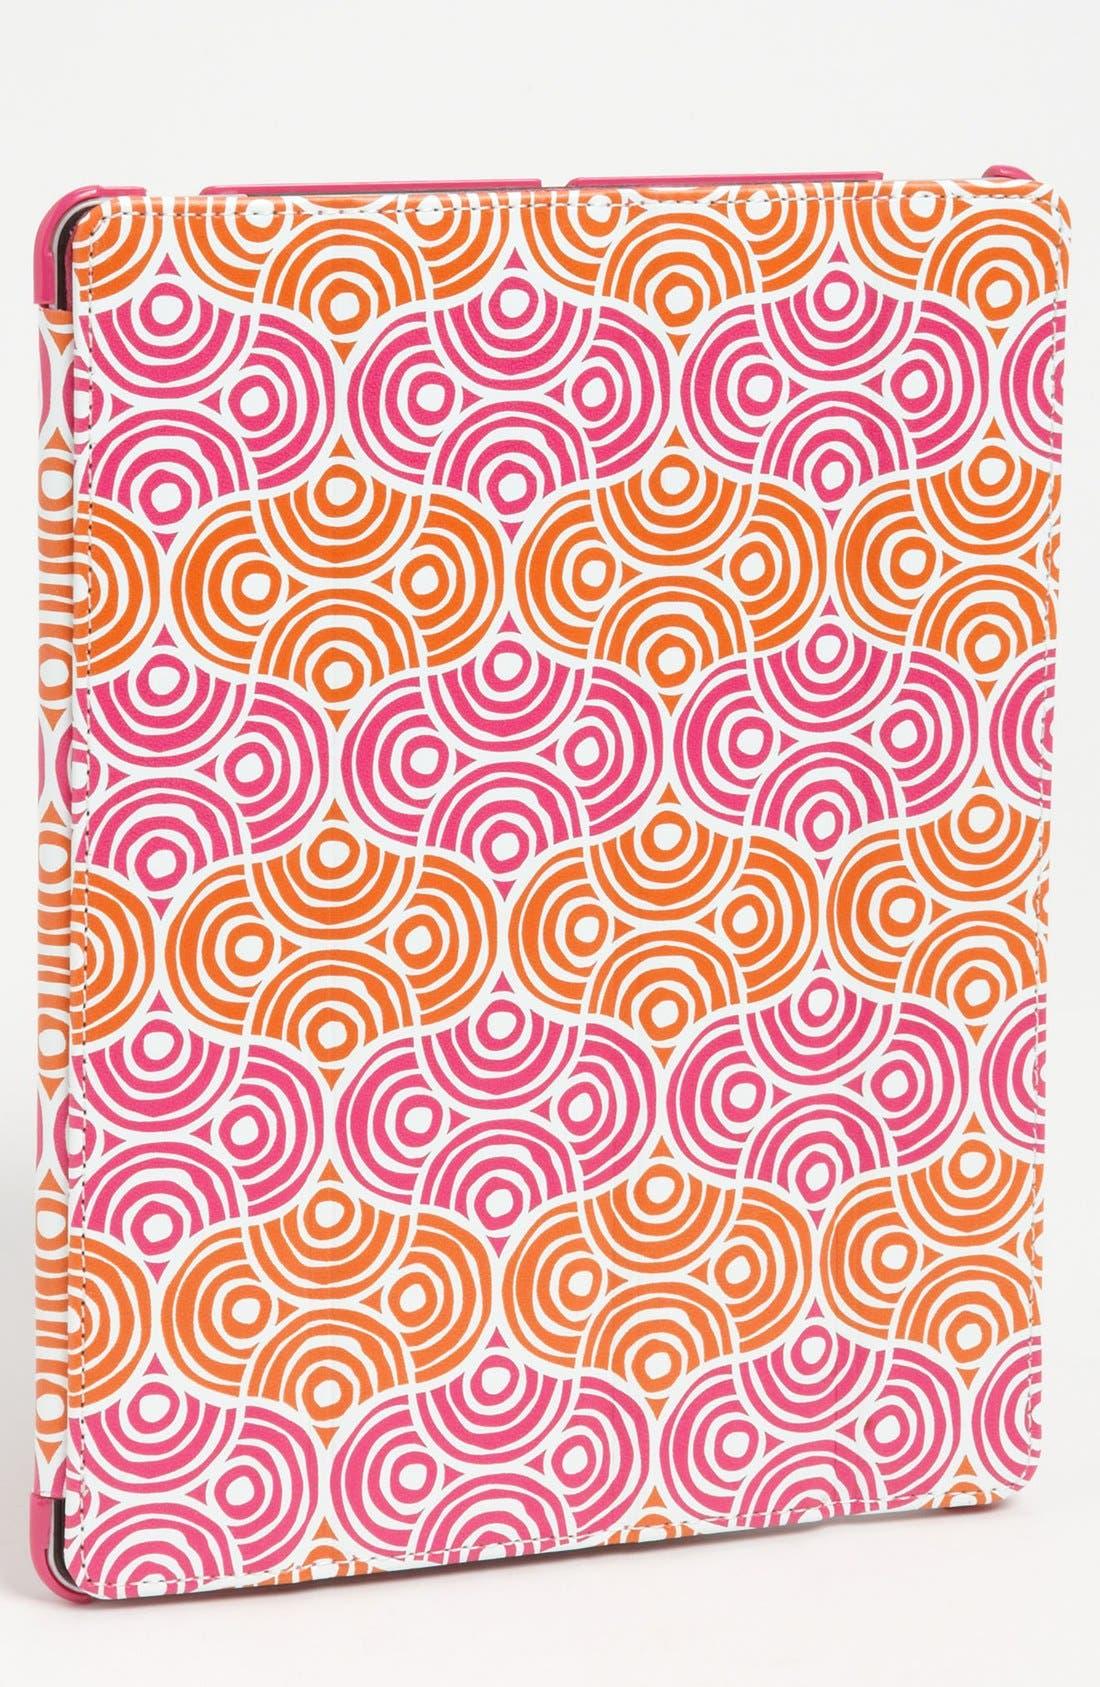 Alternate Image 1 Selected - Jonathan Adler 'Circle Ornaments' iPad 2 & 3 Case